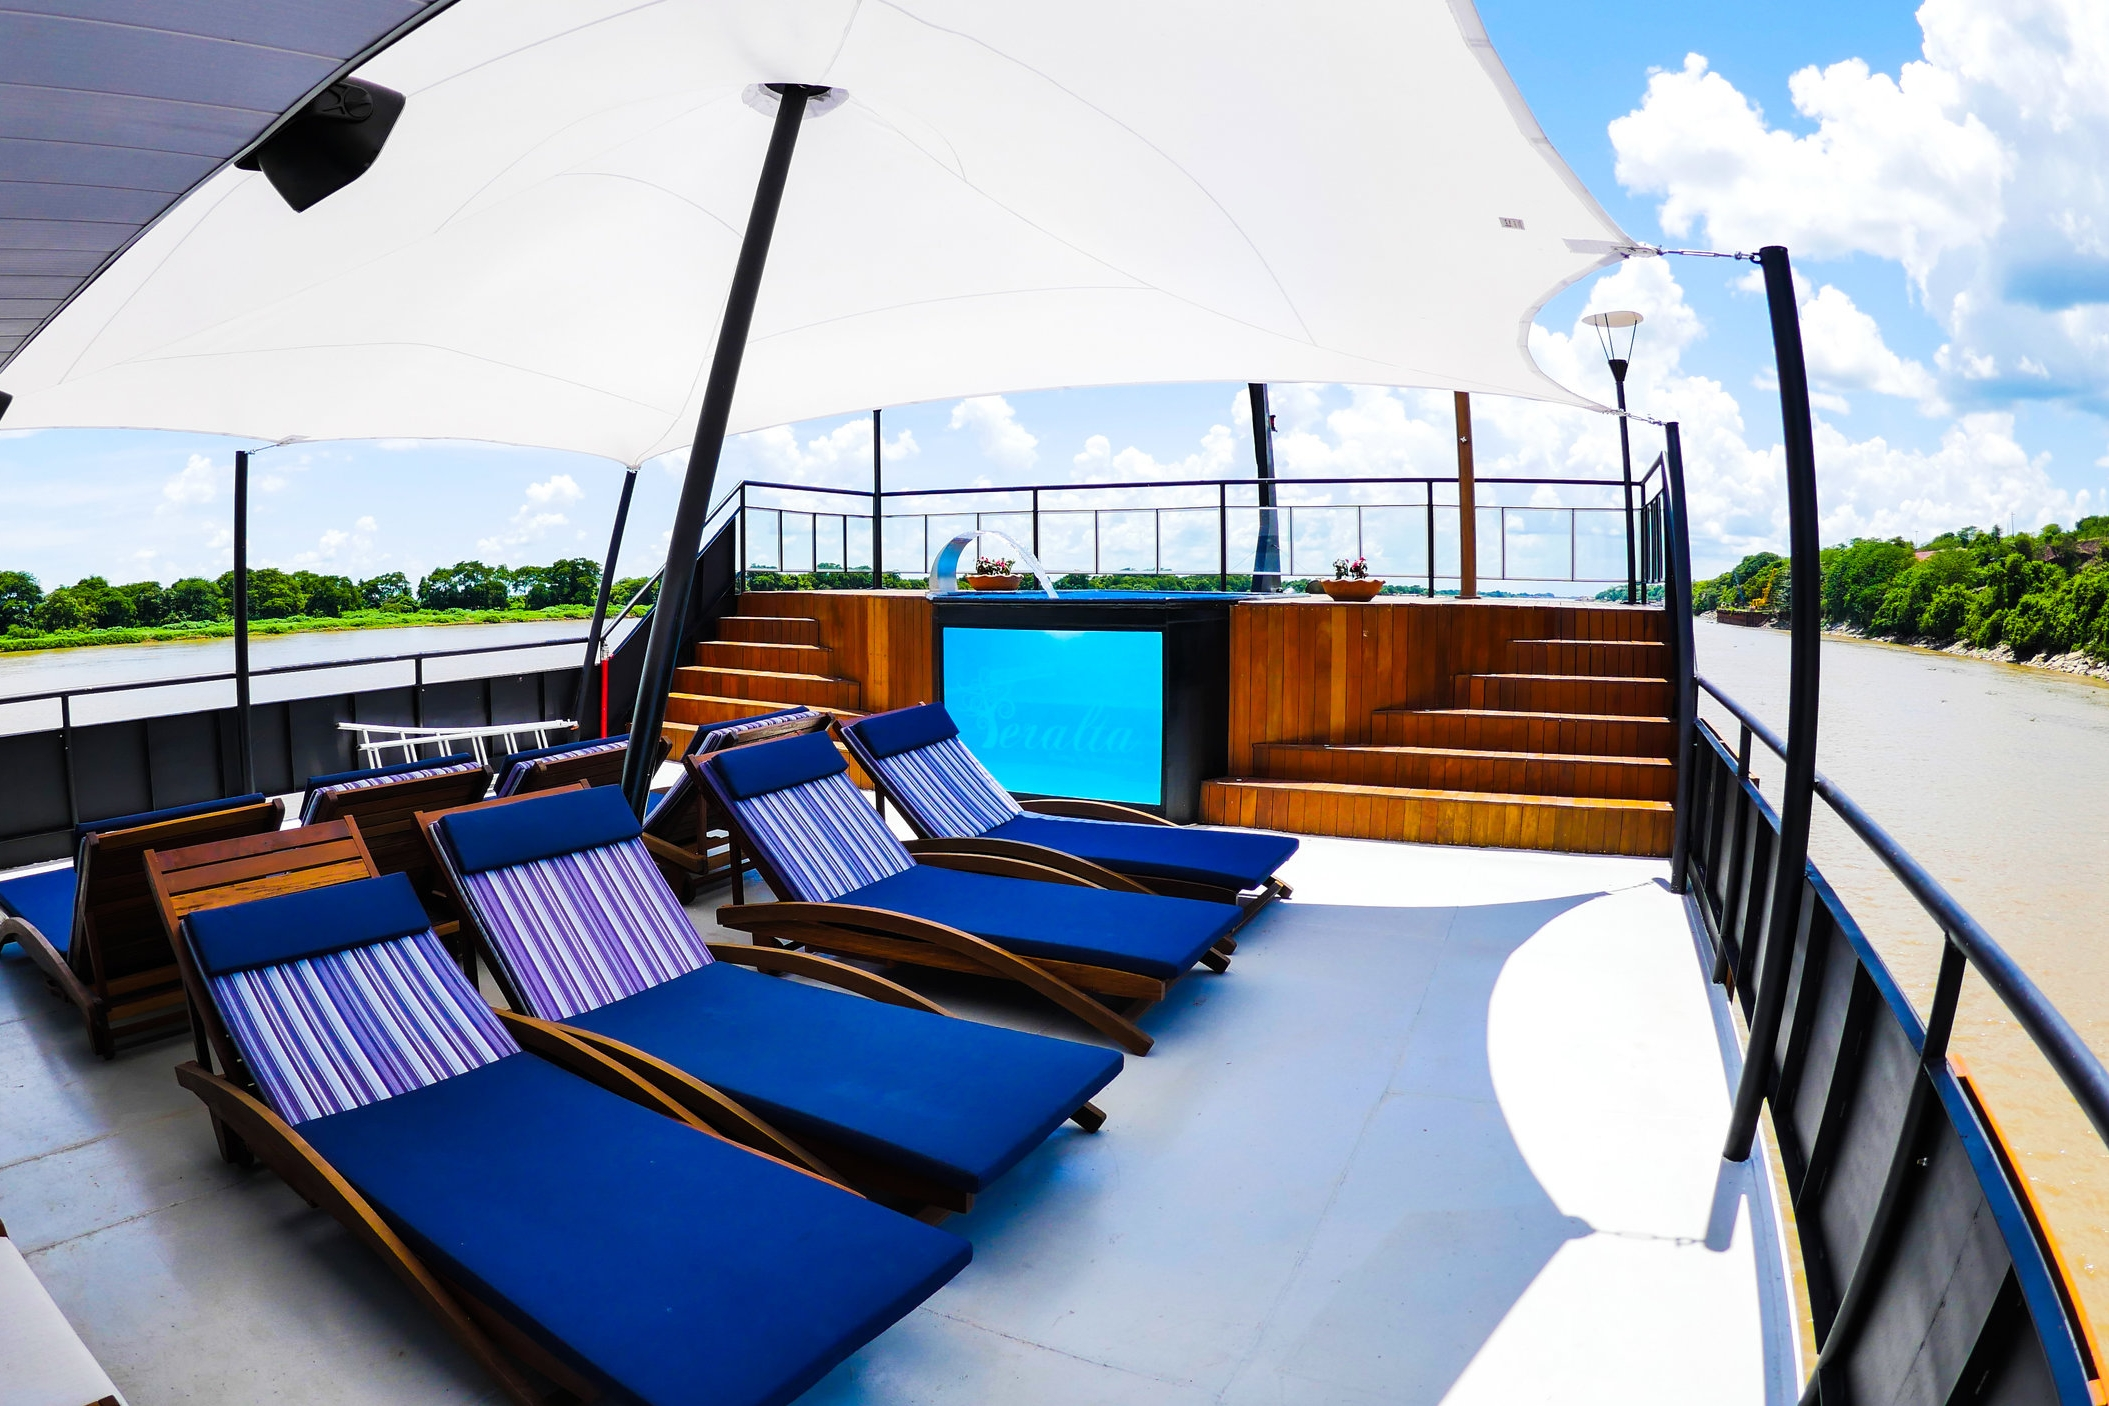 pantanal cruise